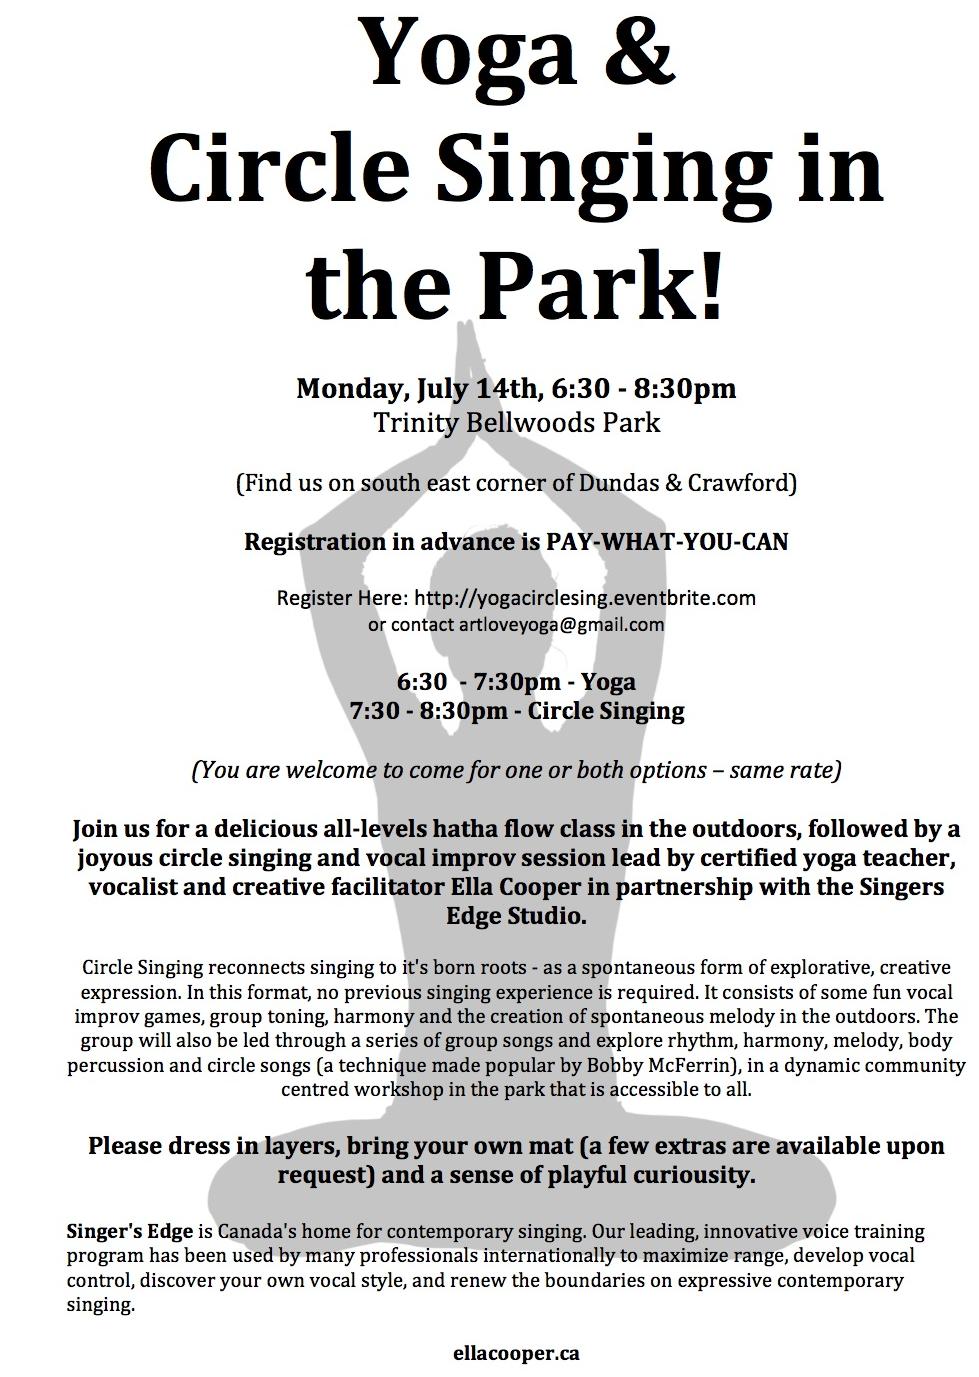 Yoga & Circle Singing In The Park